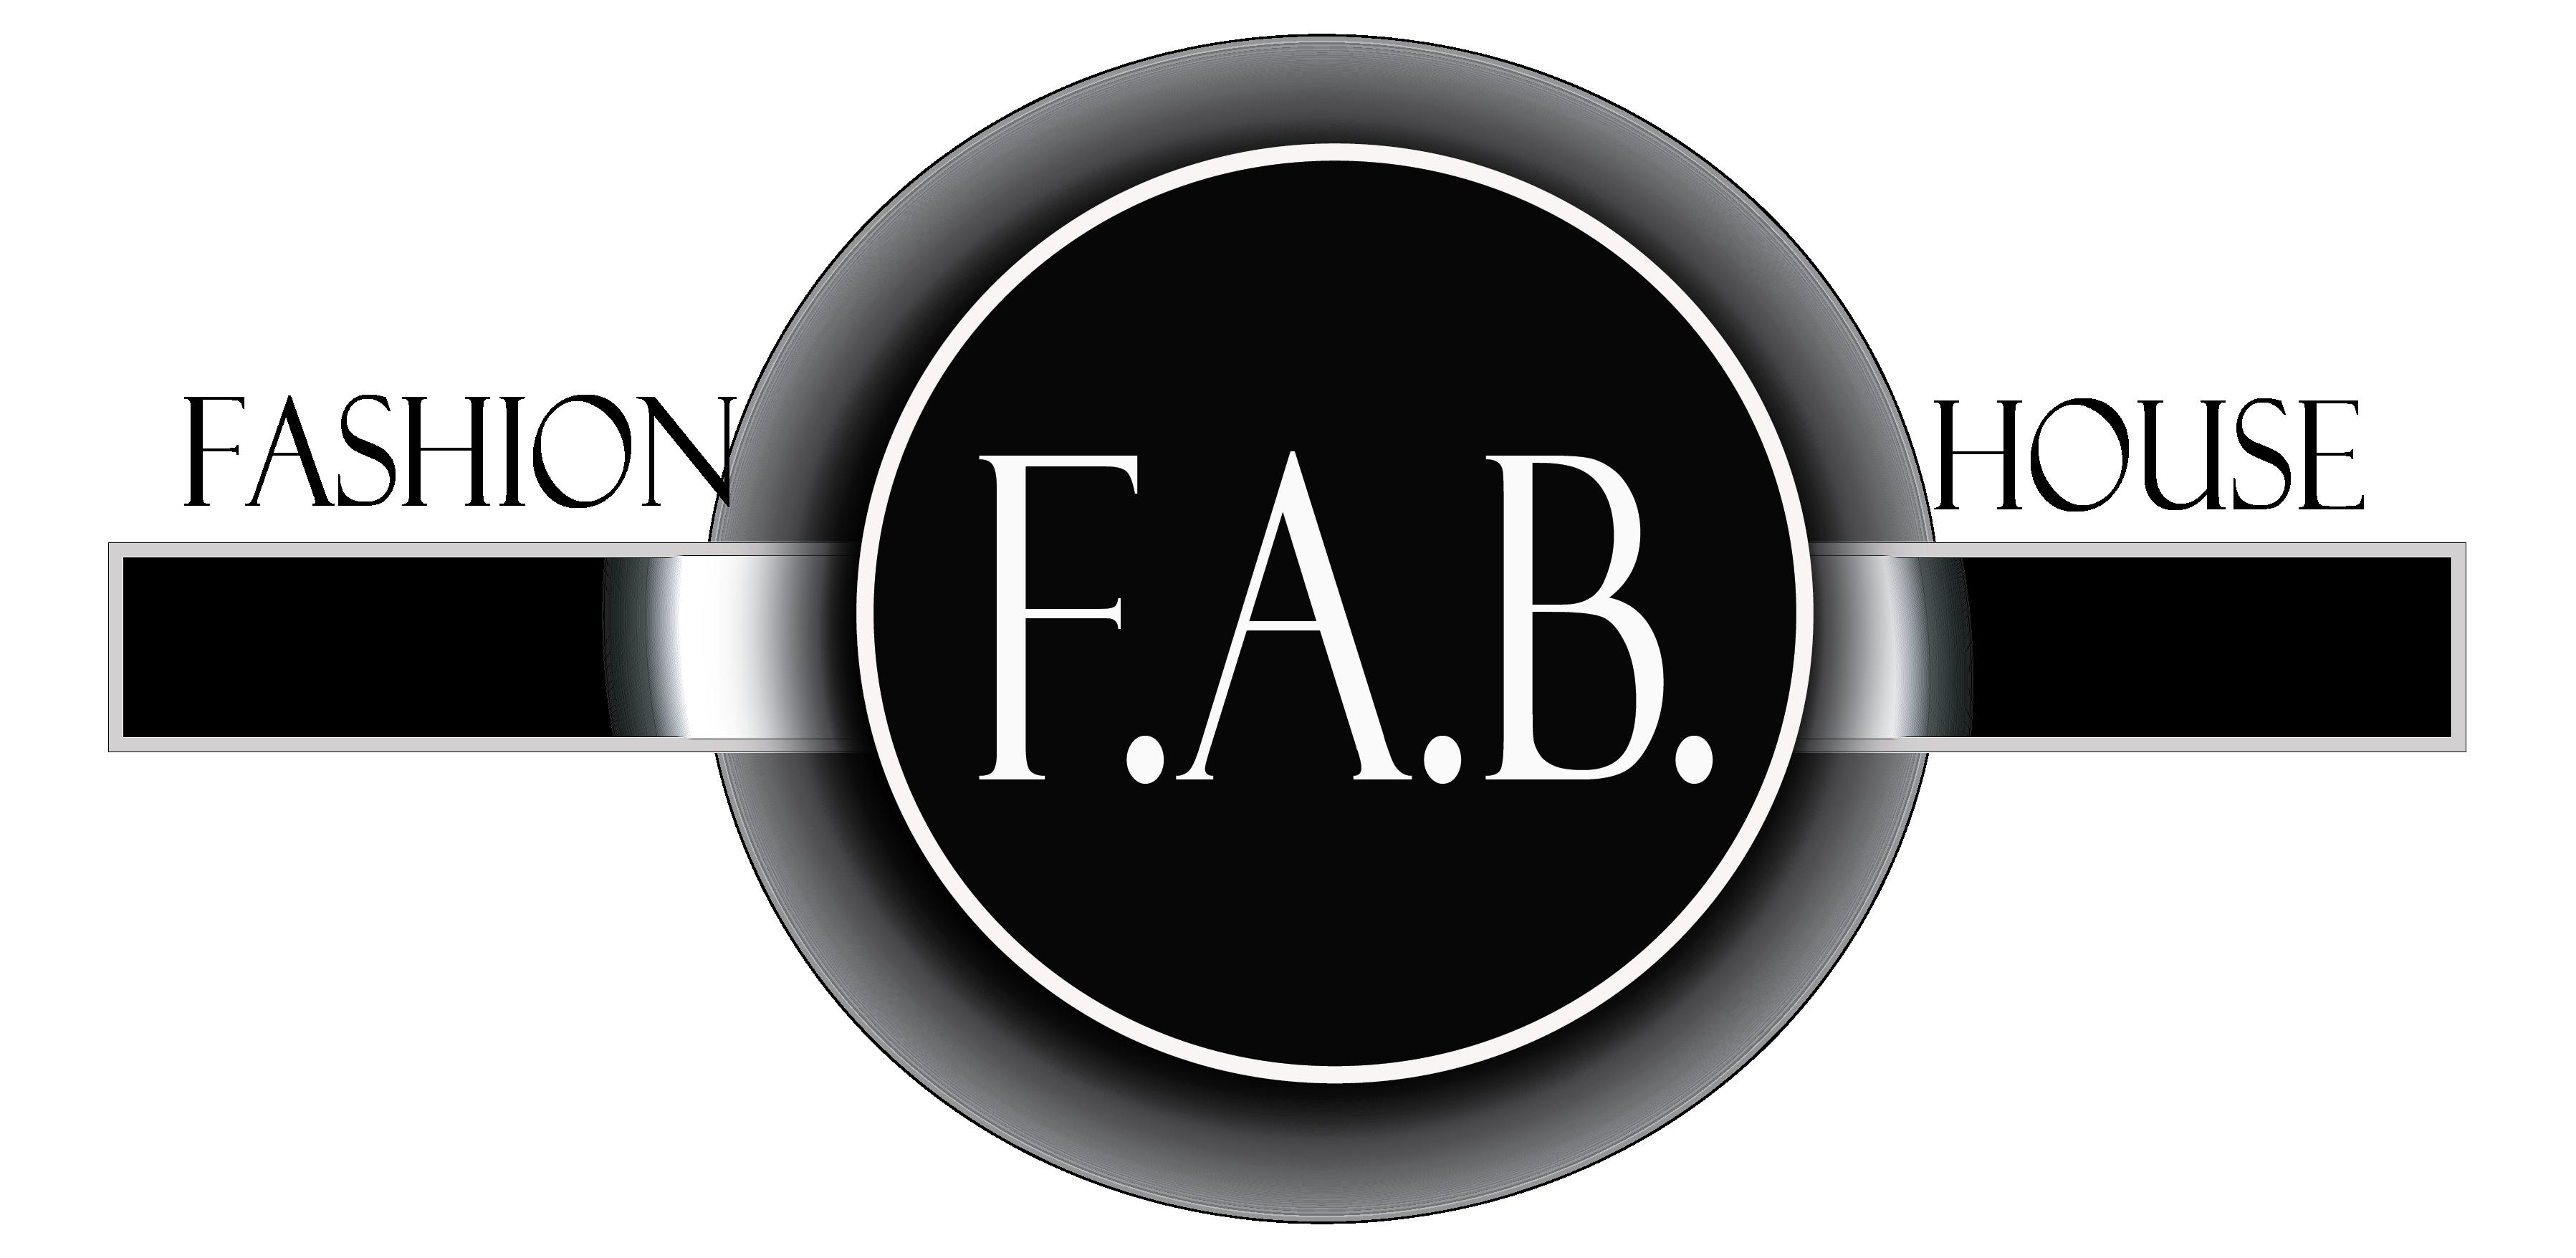 Fashion House of F.A.B